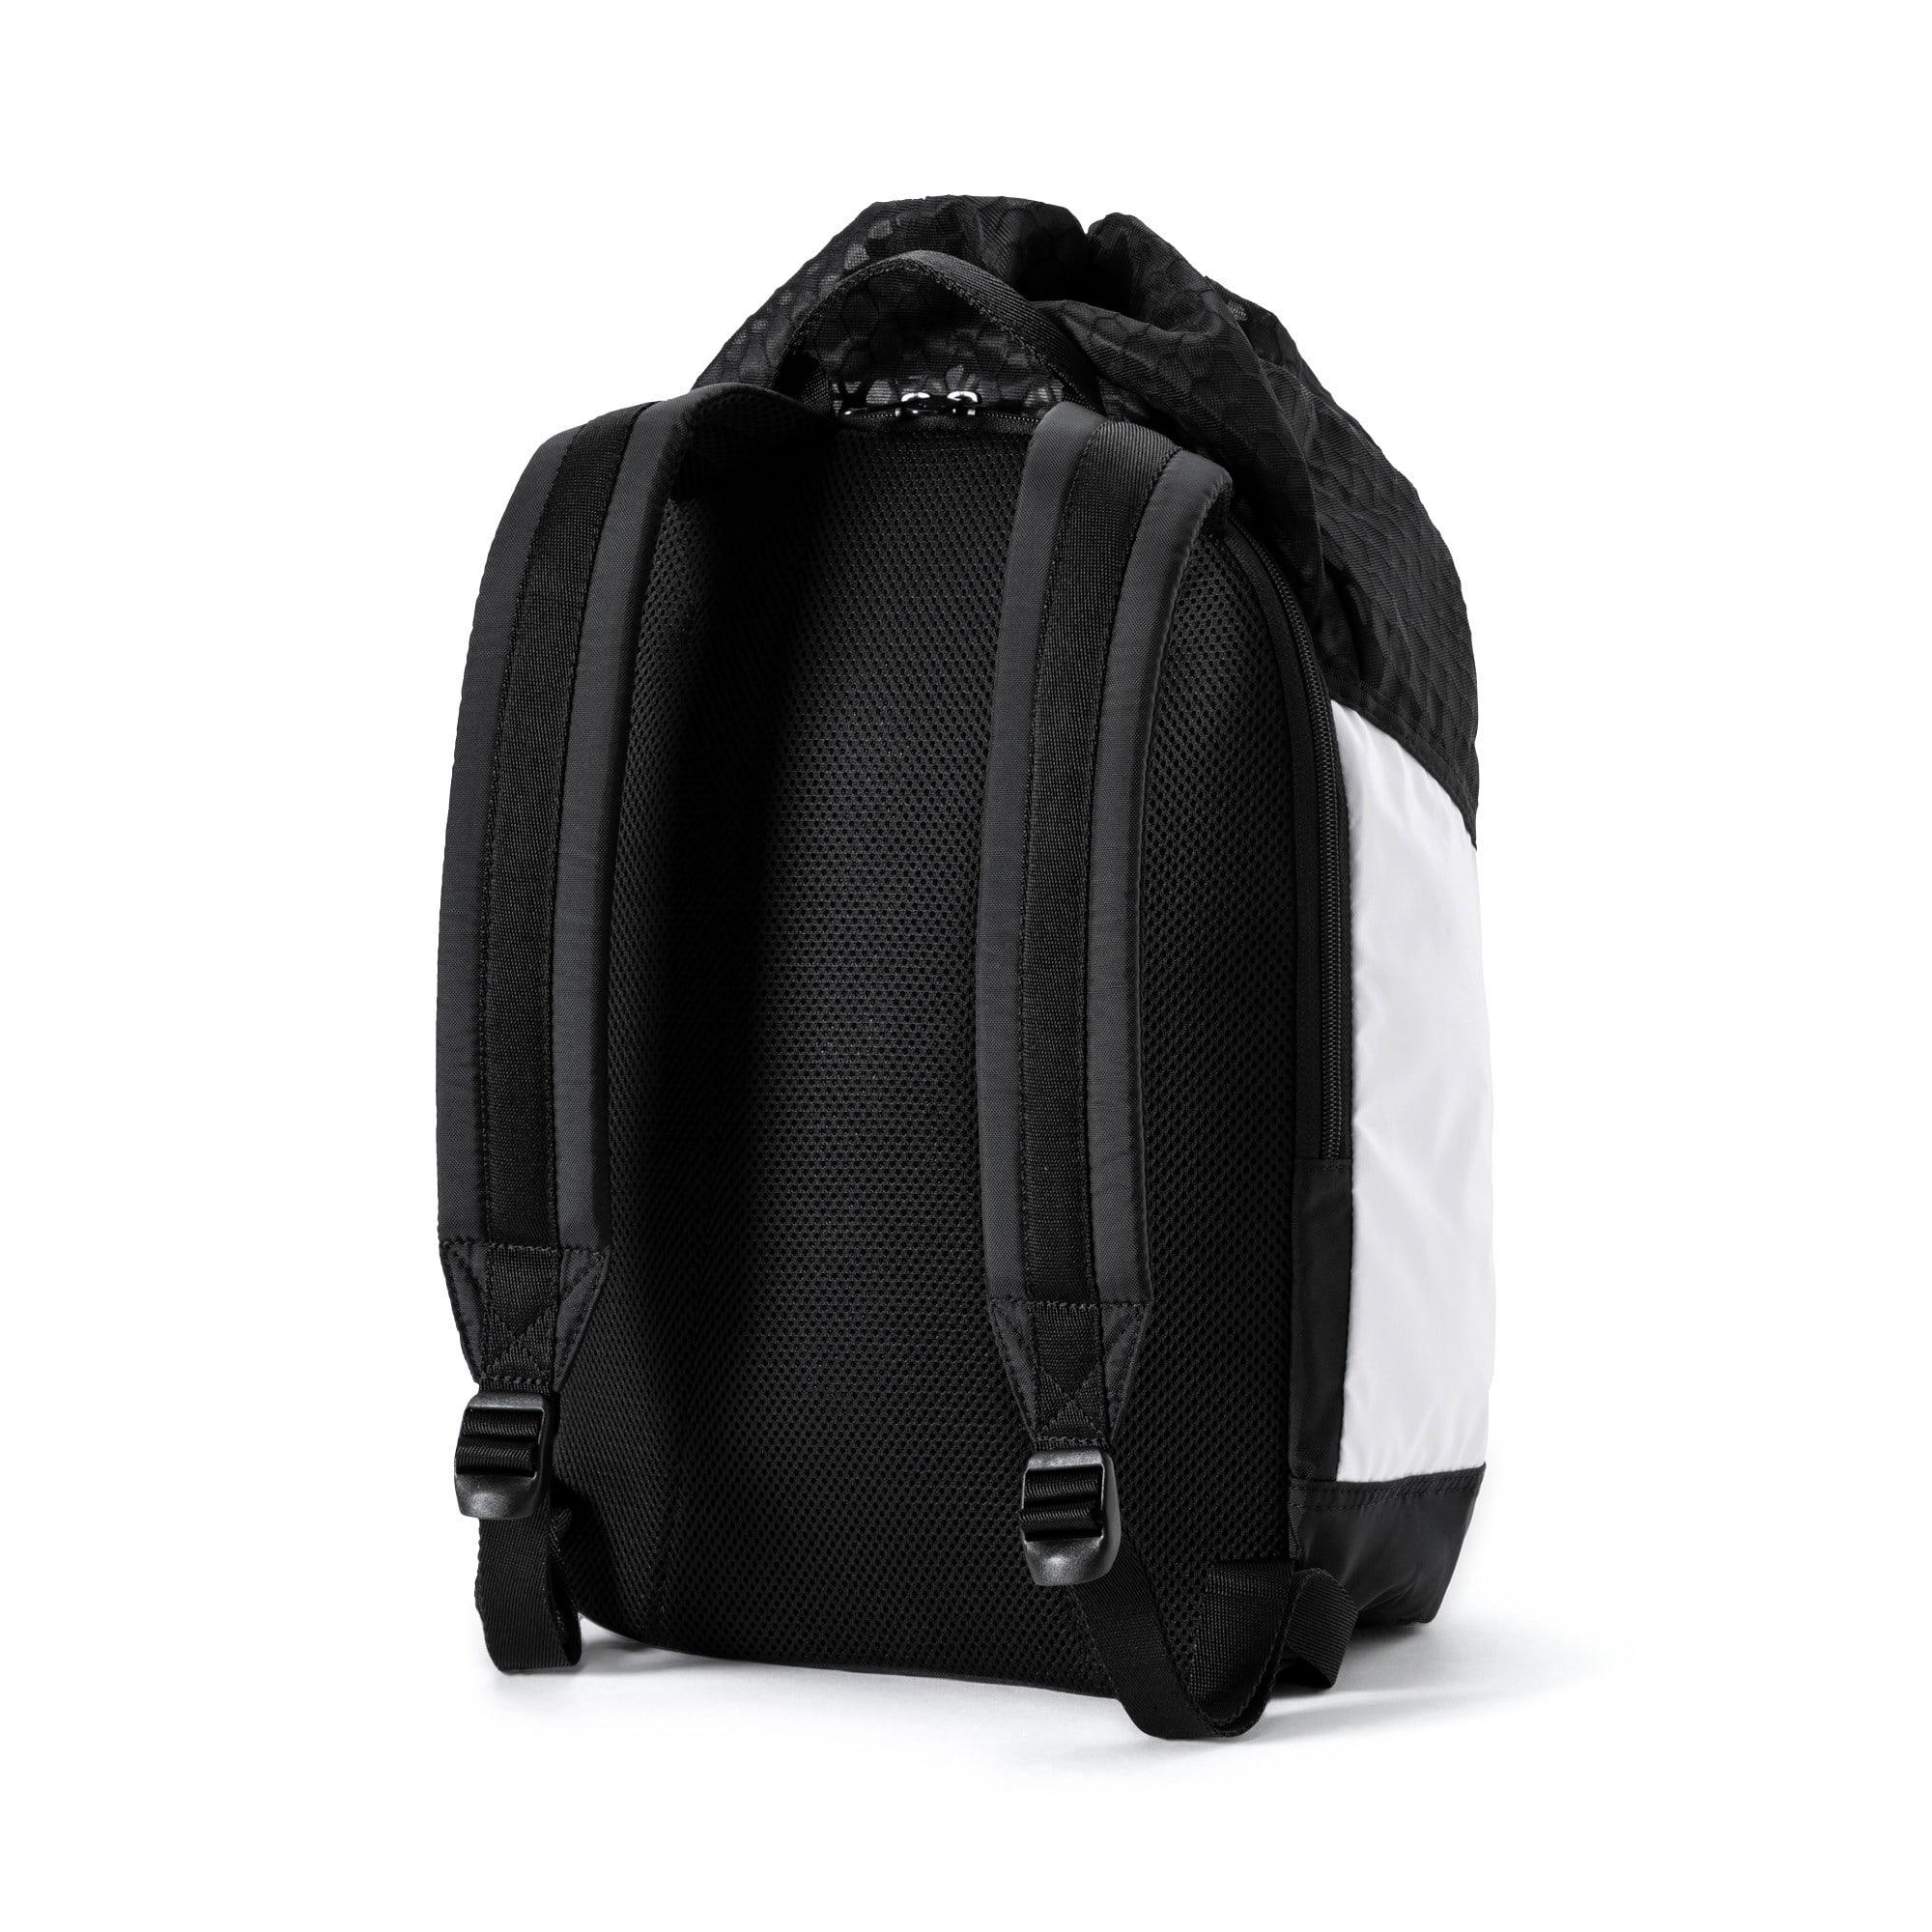 Thumbnail 2 of Ambition Gold Women's Backpack, Puma White-Puma Black, medium